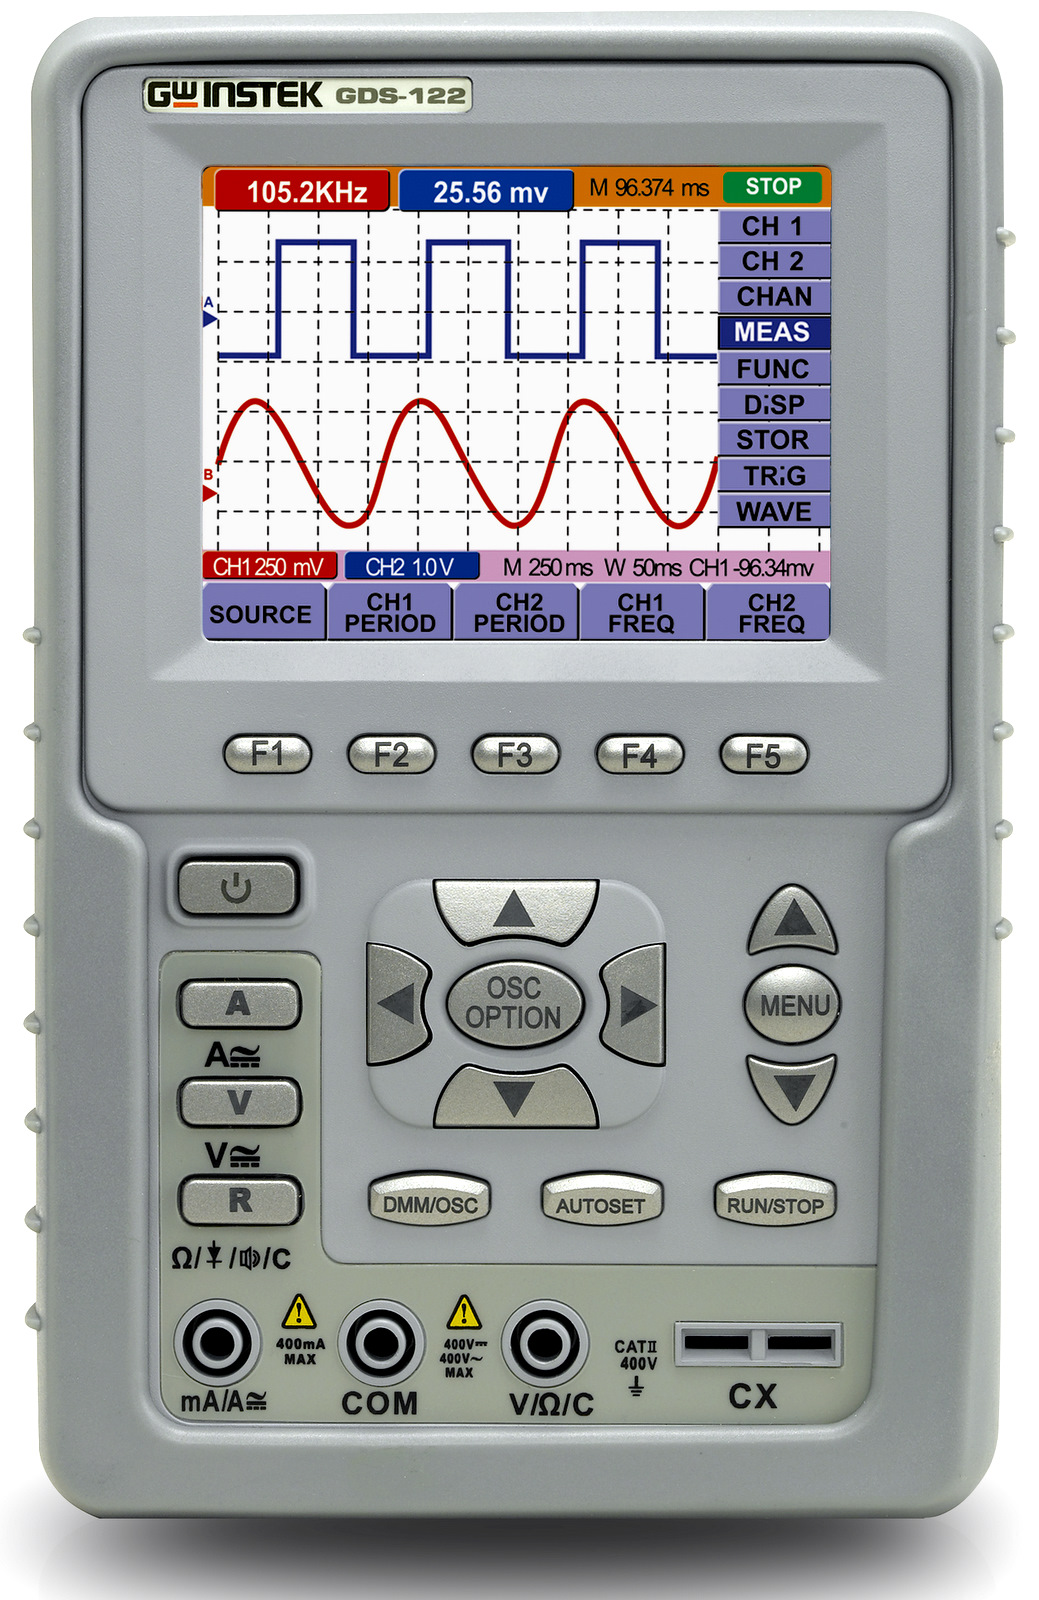 Gw Instek Gds-122 20Mhz 2Ch Handheld Oscilloscope